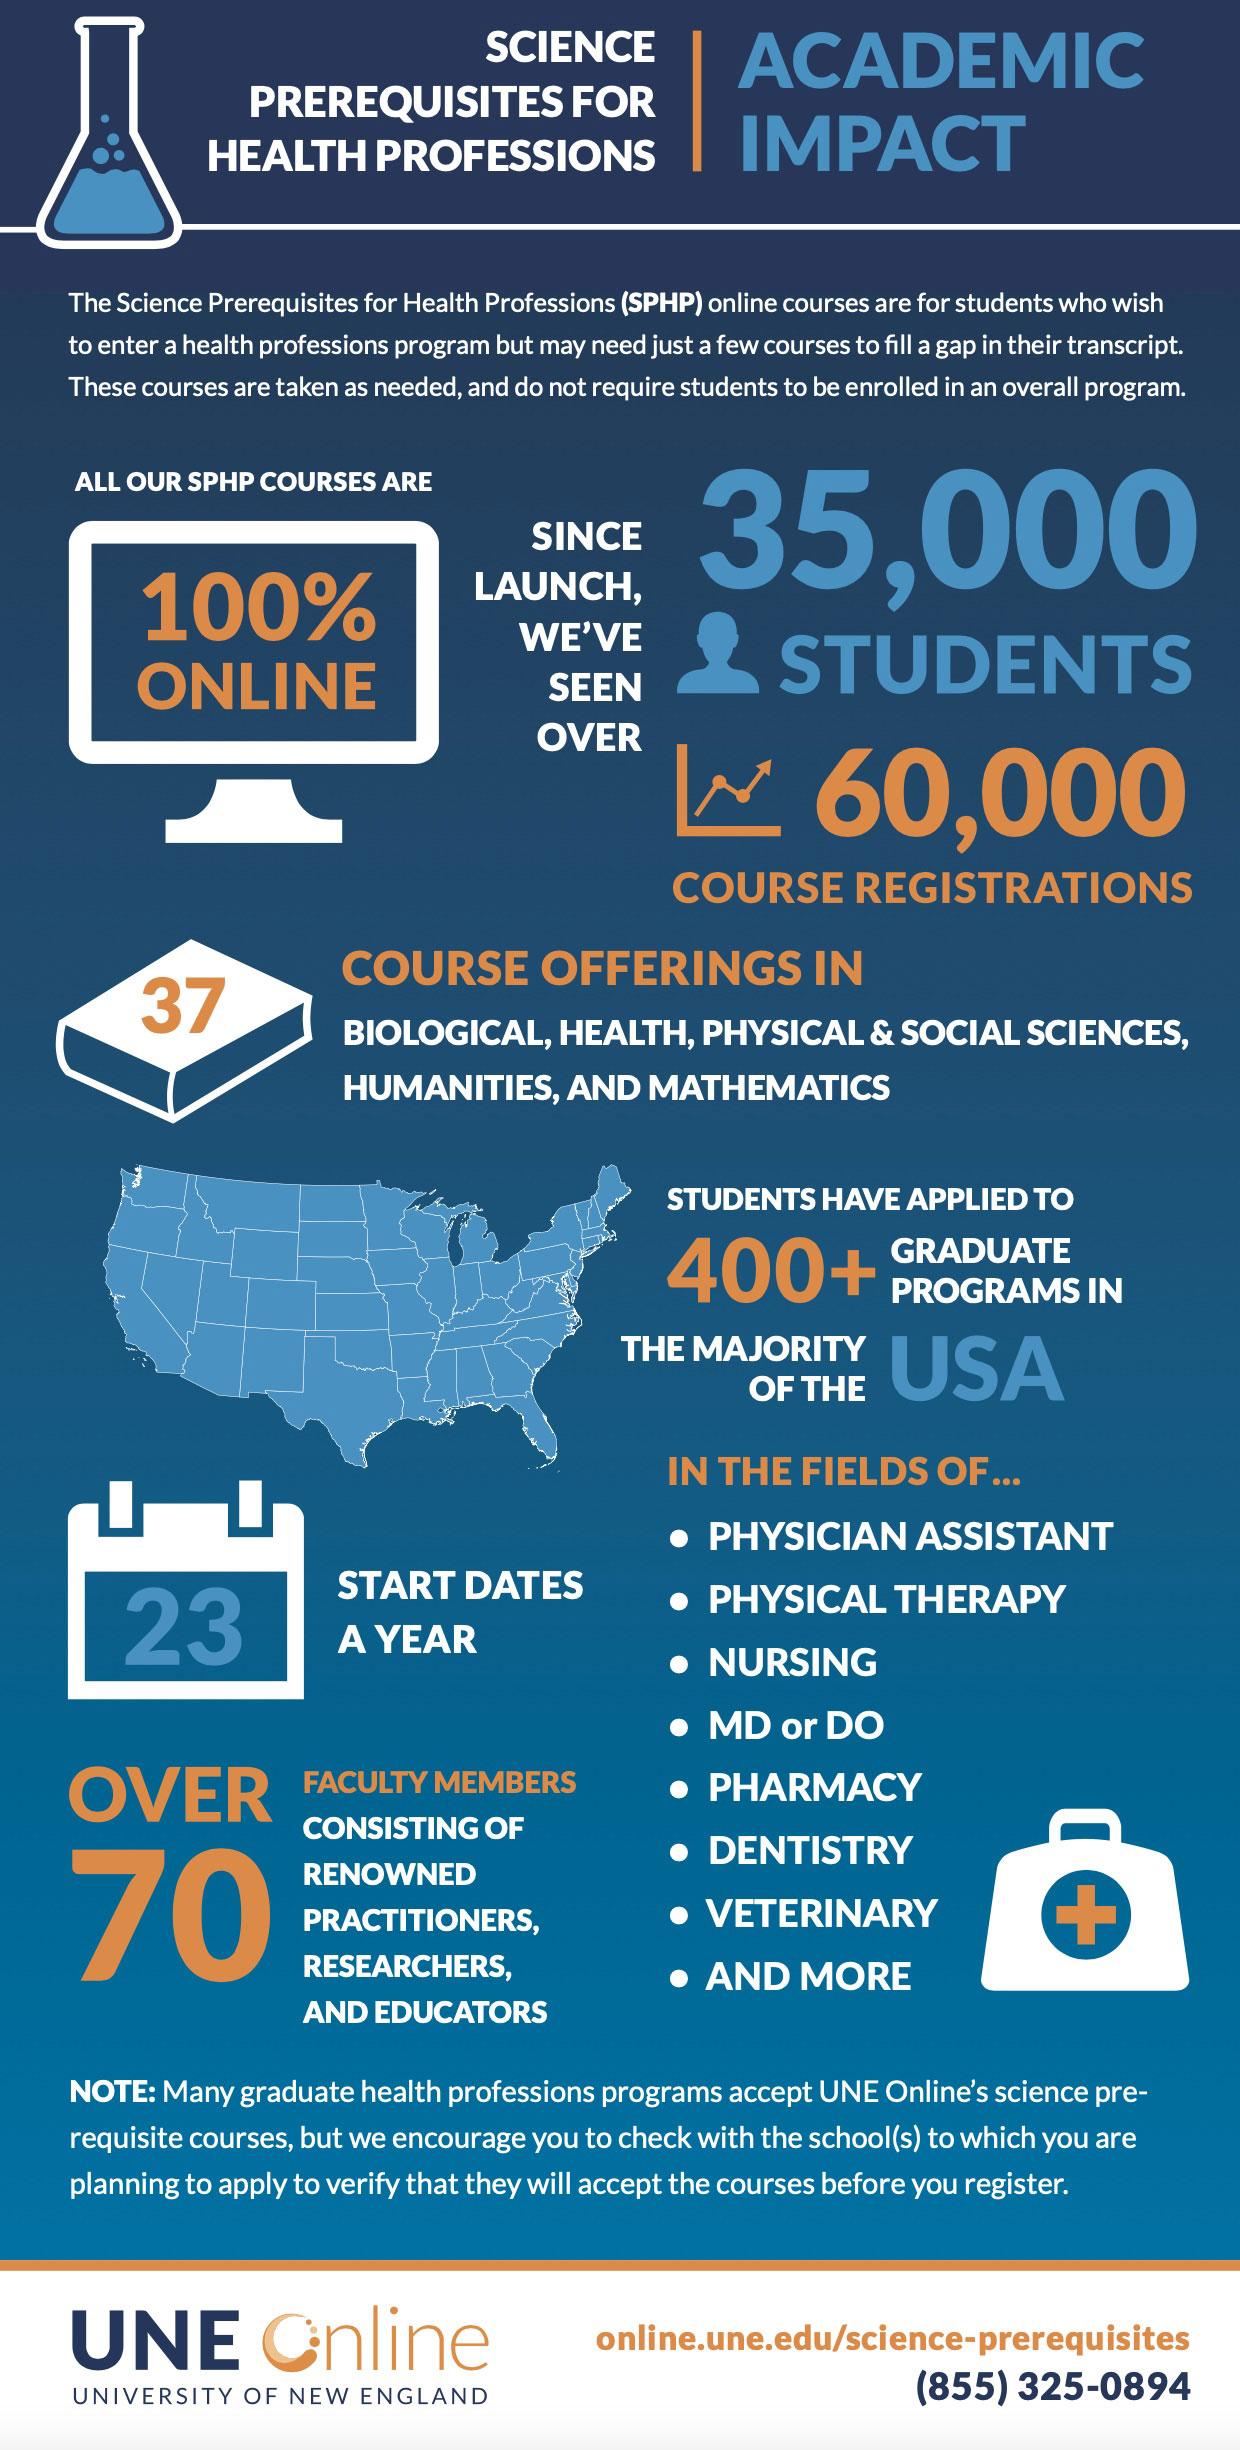 SPHP Student Academic Impact Infographic